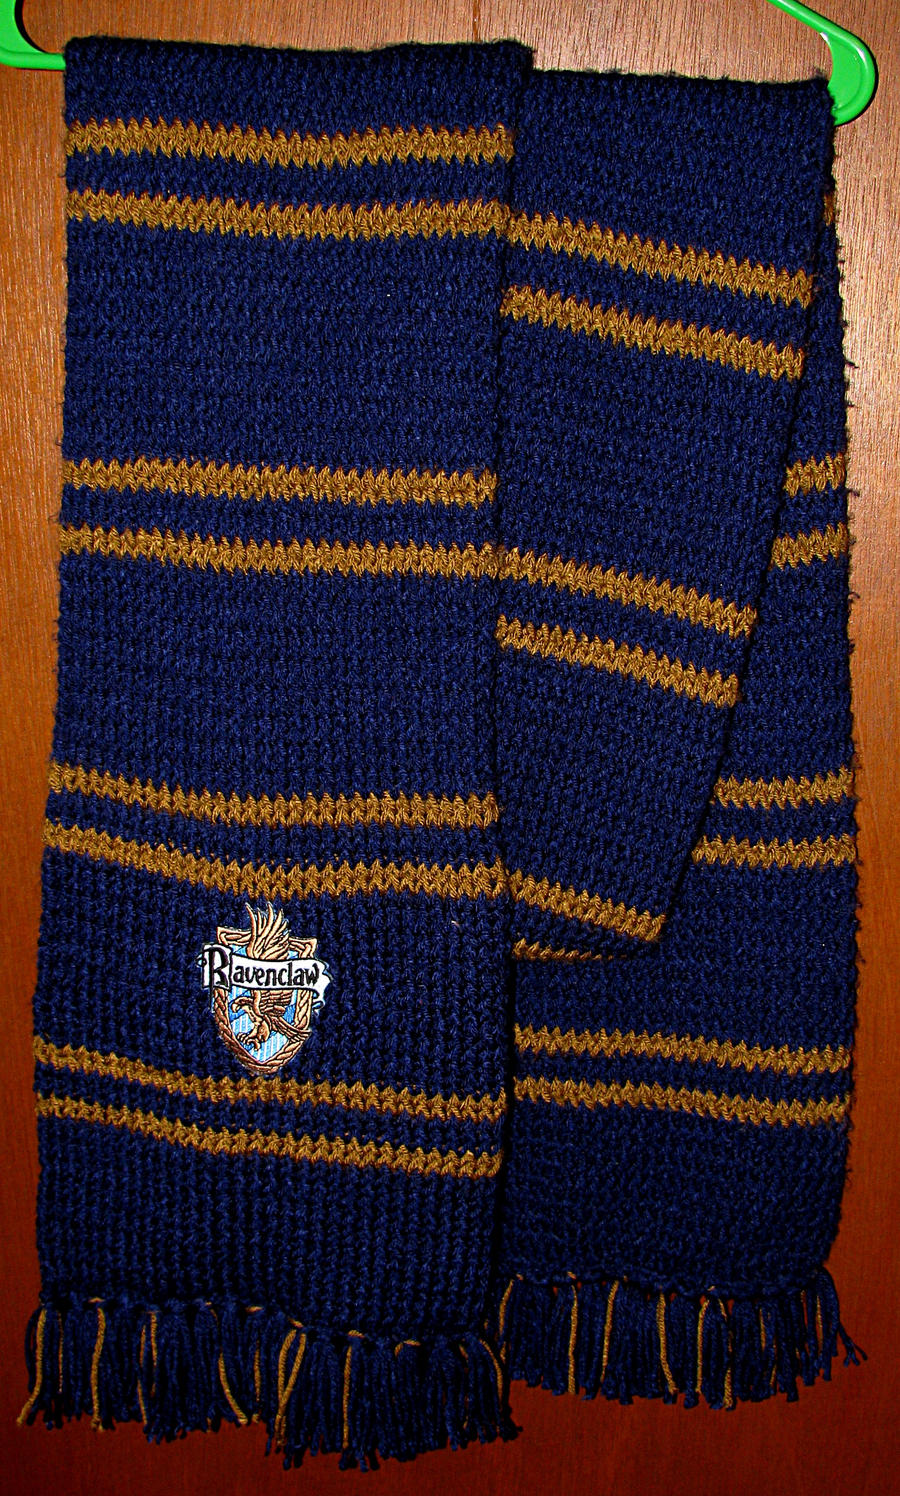 Ravenclaw Scarf Knitting Pattern : Hogwarts Scarf Type 2 - Raven by gabiemiller on DeviantArt